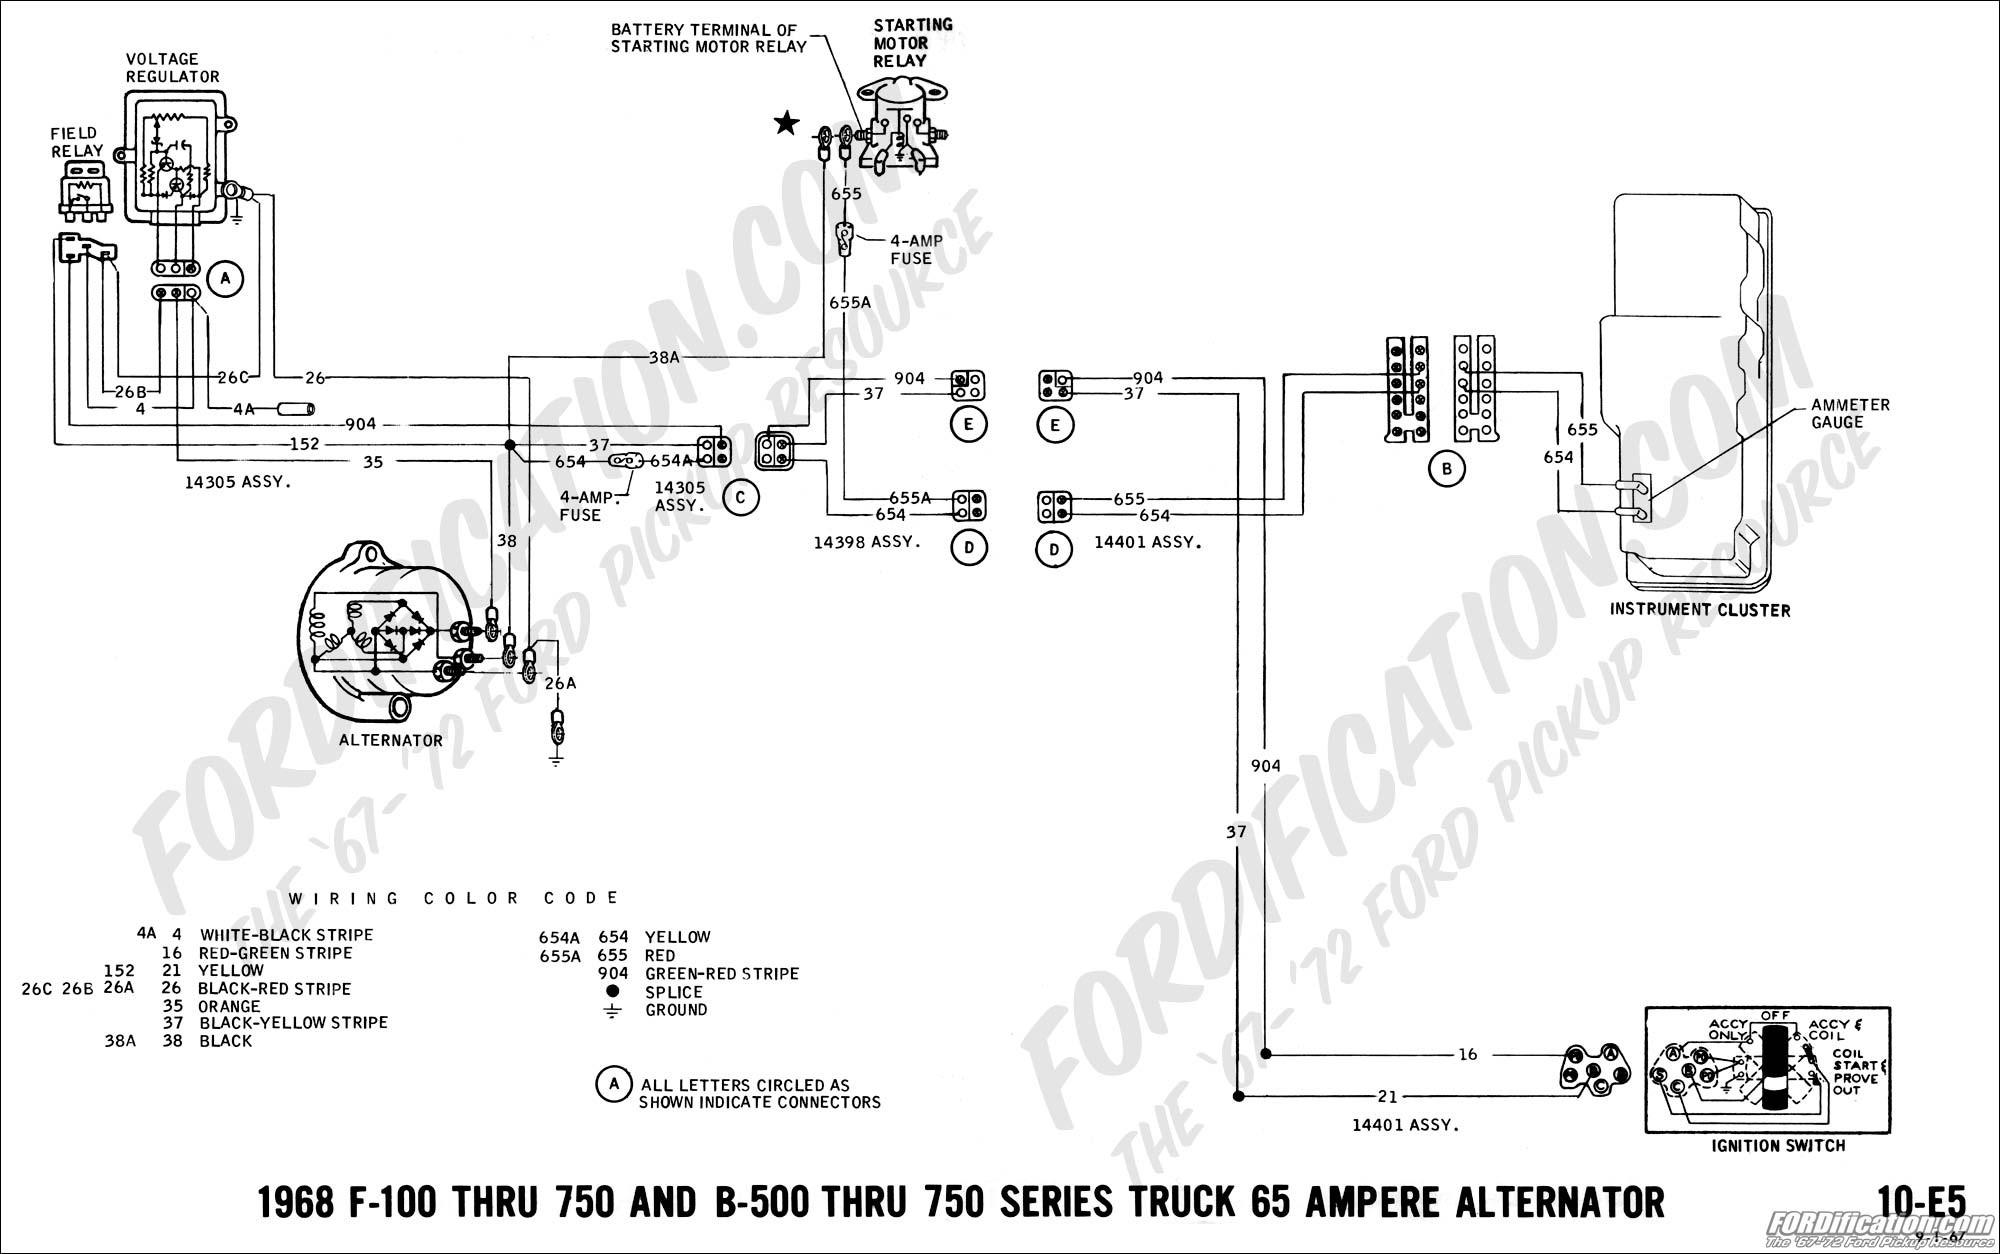 Ford Alternator Wiring Diagram New